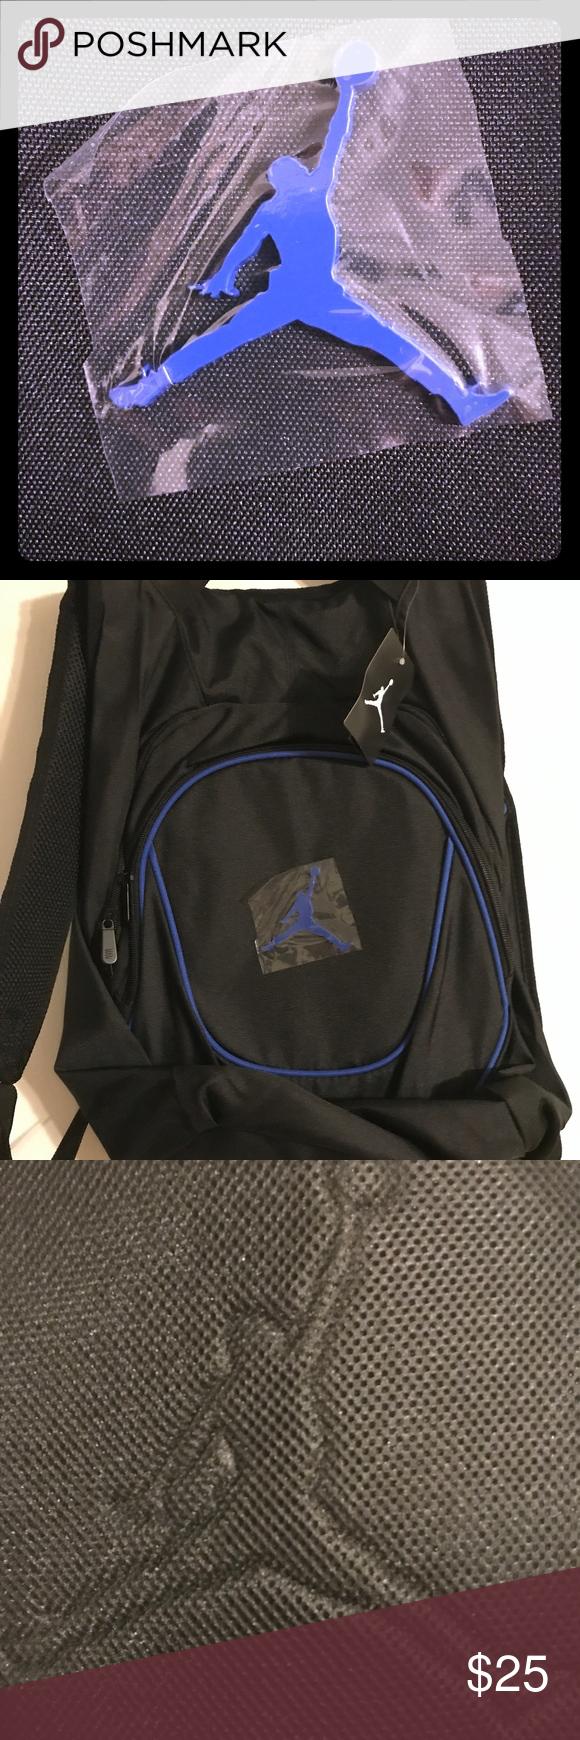 551baf4b3cb8 Air jordan backpack brand new w tags